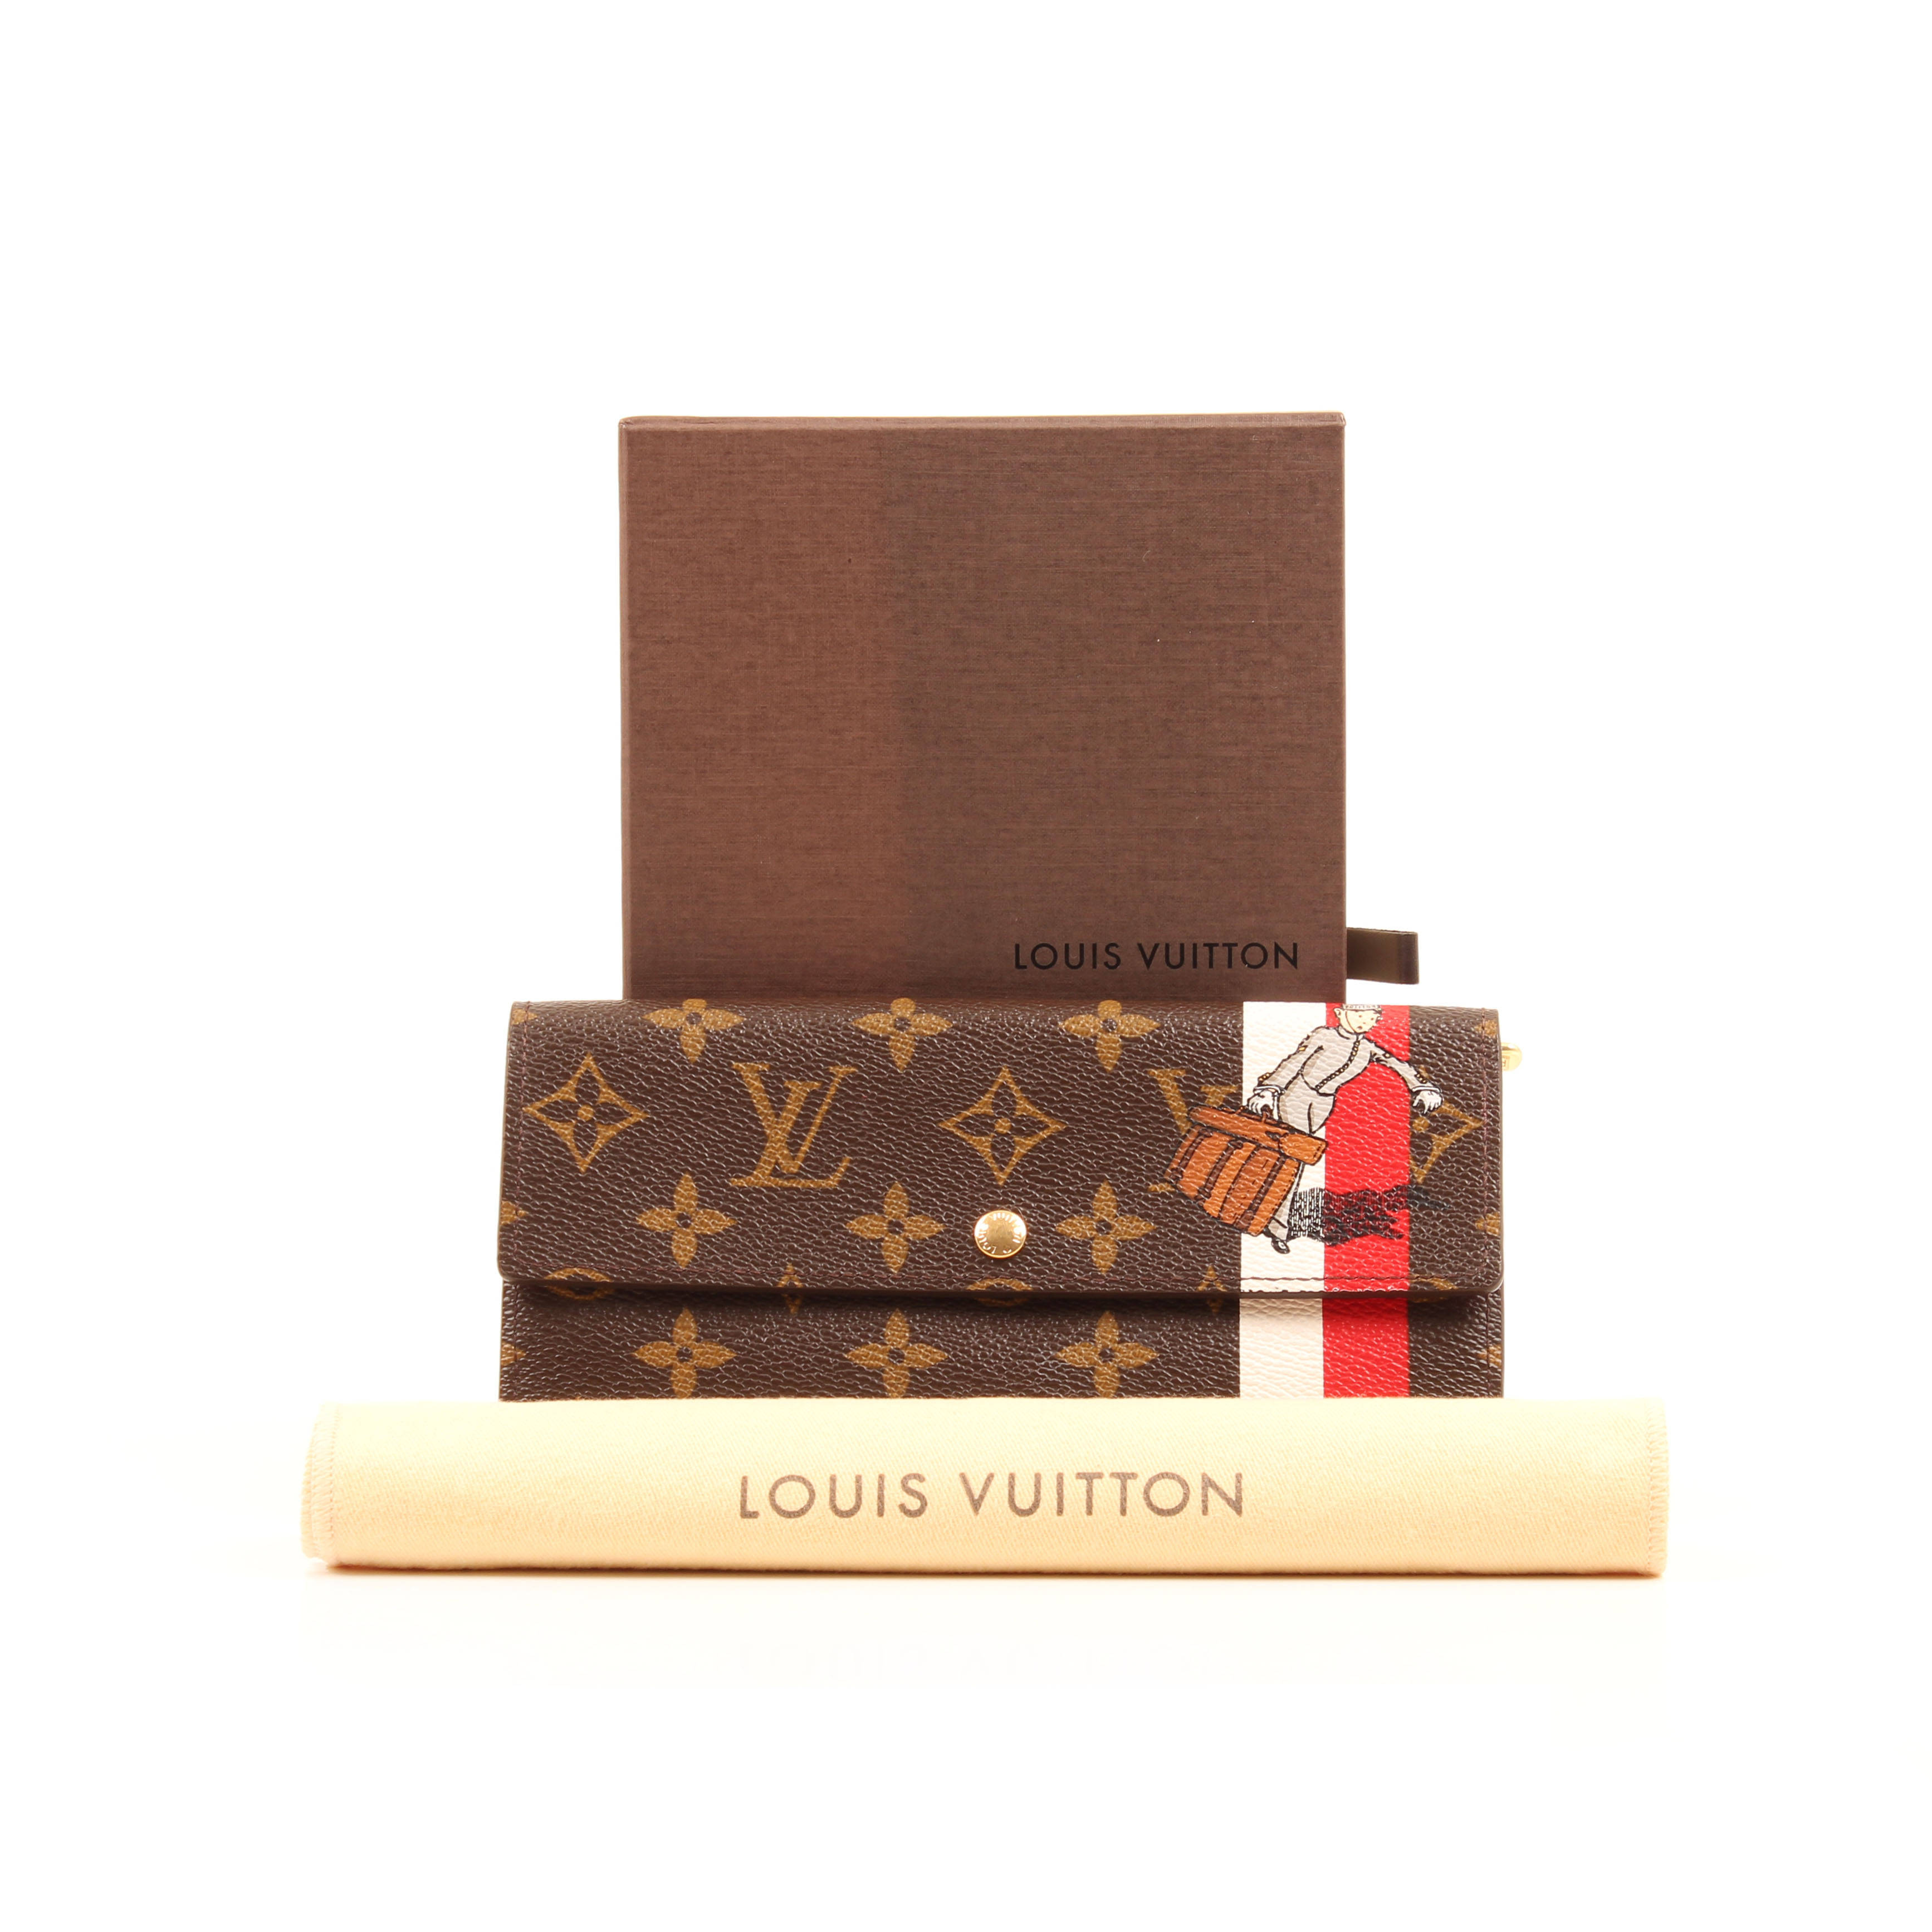 louis vuitton sarah groom wallet limited edition monogram funda caja